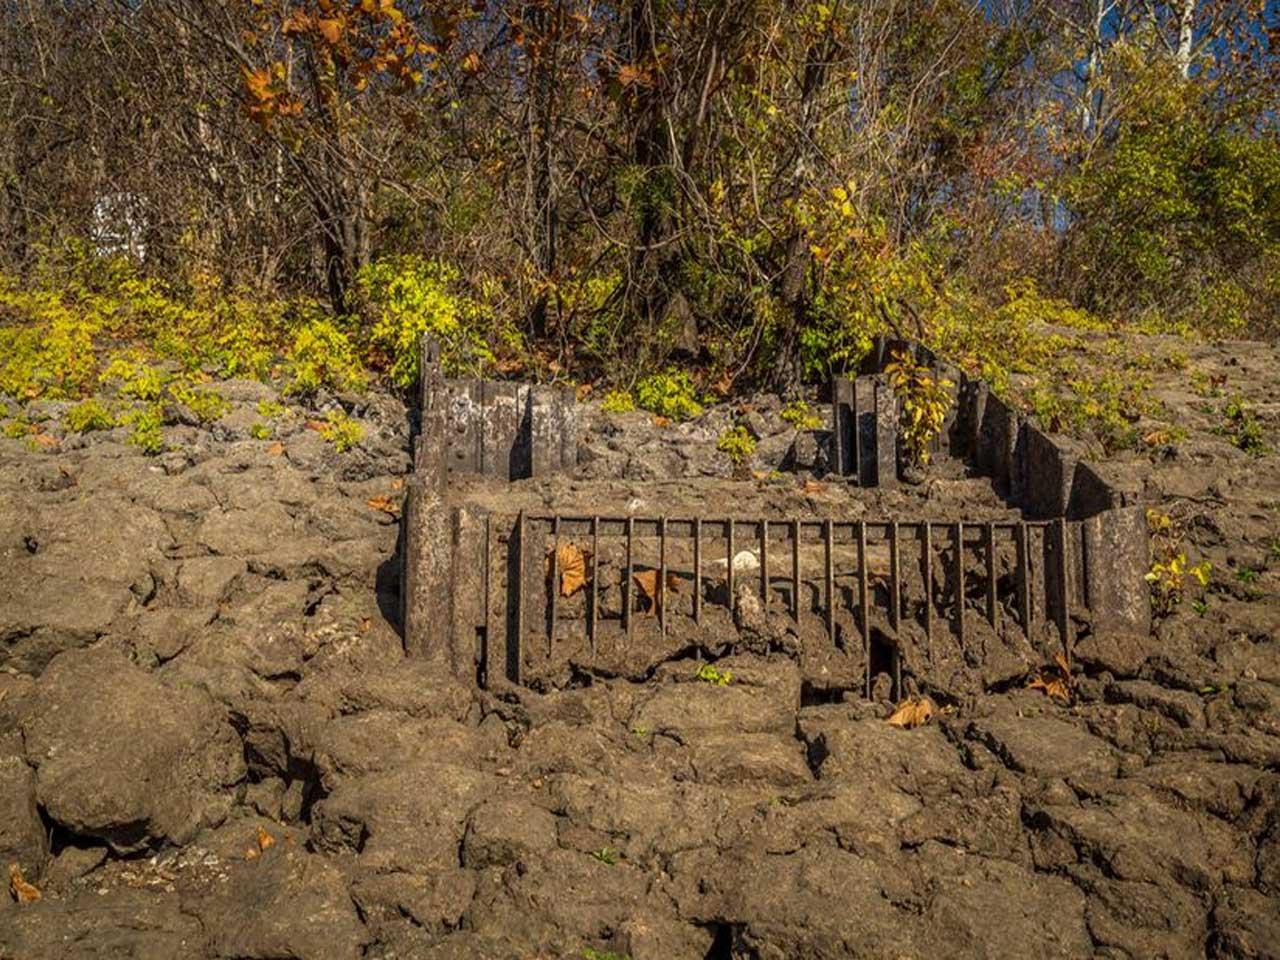 Ozark Hills Lost Copper Mine, Missouri